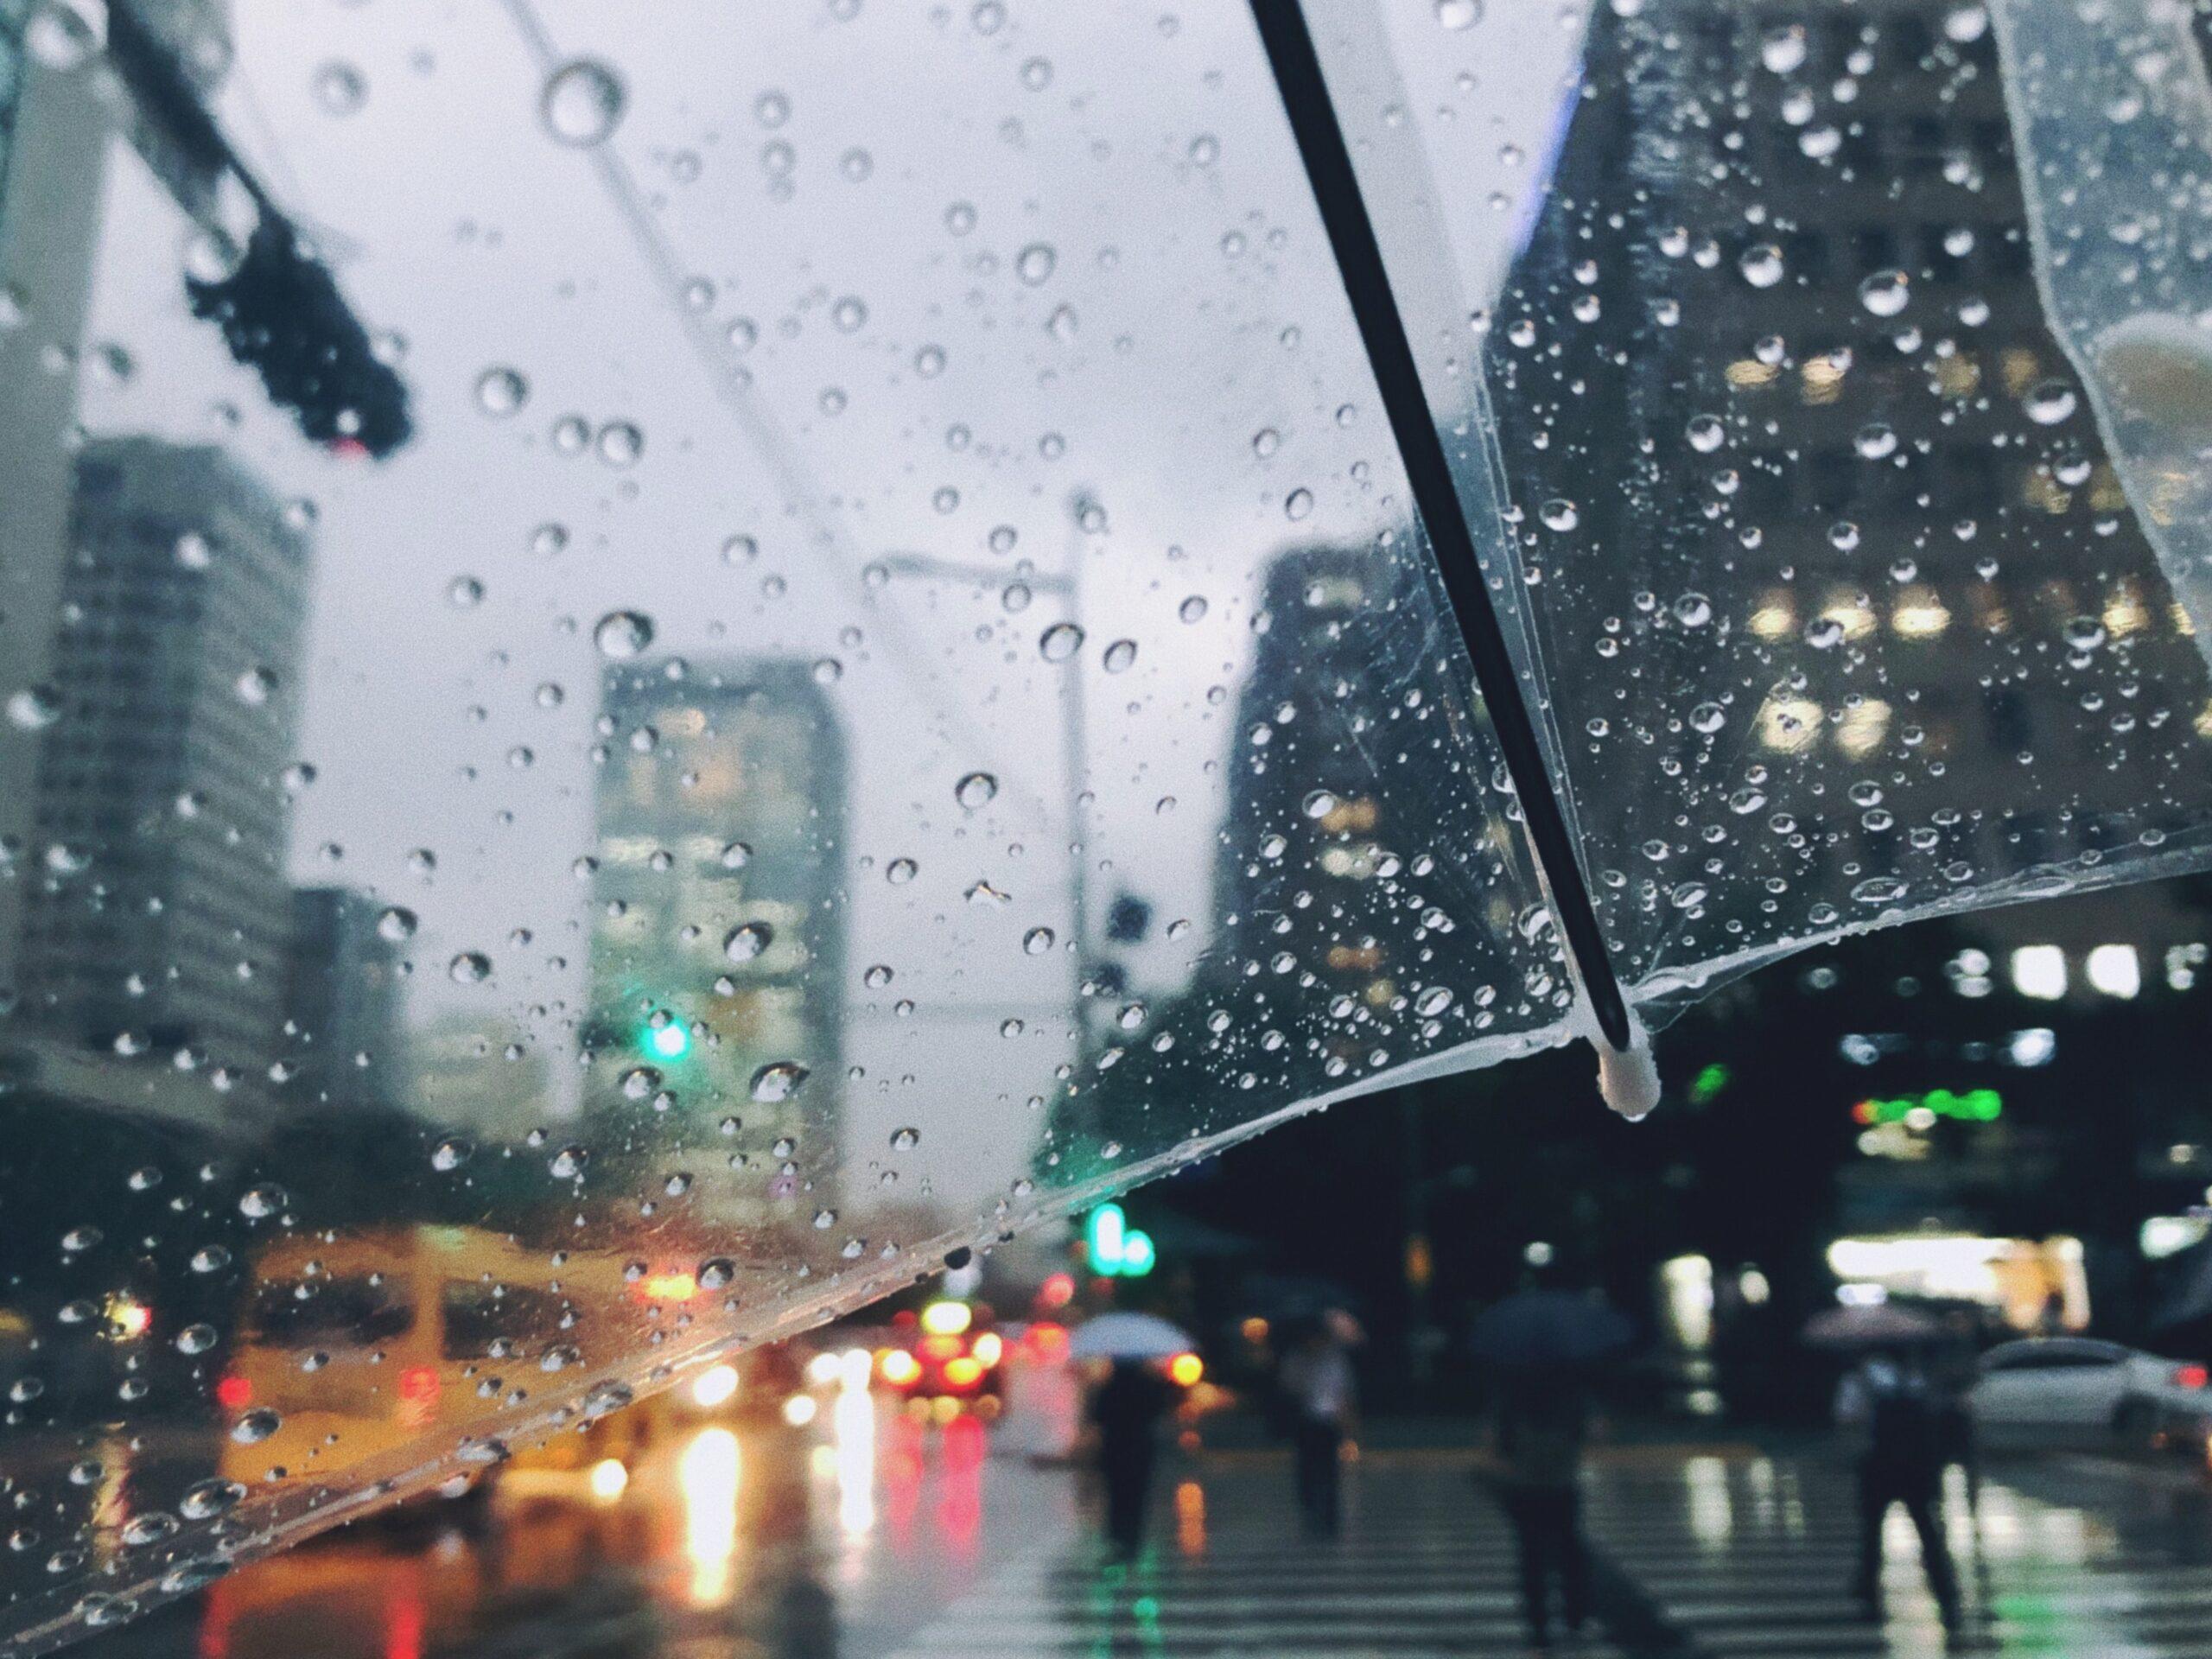 Hot and humid monsoon rain season in Korea